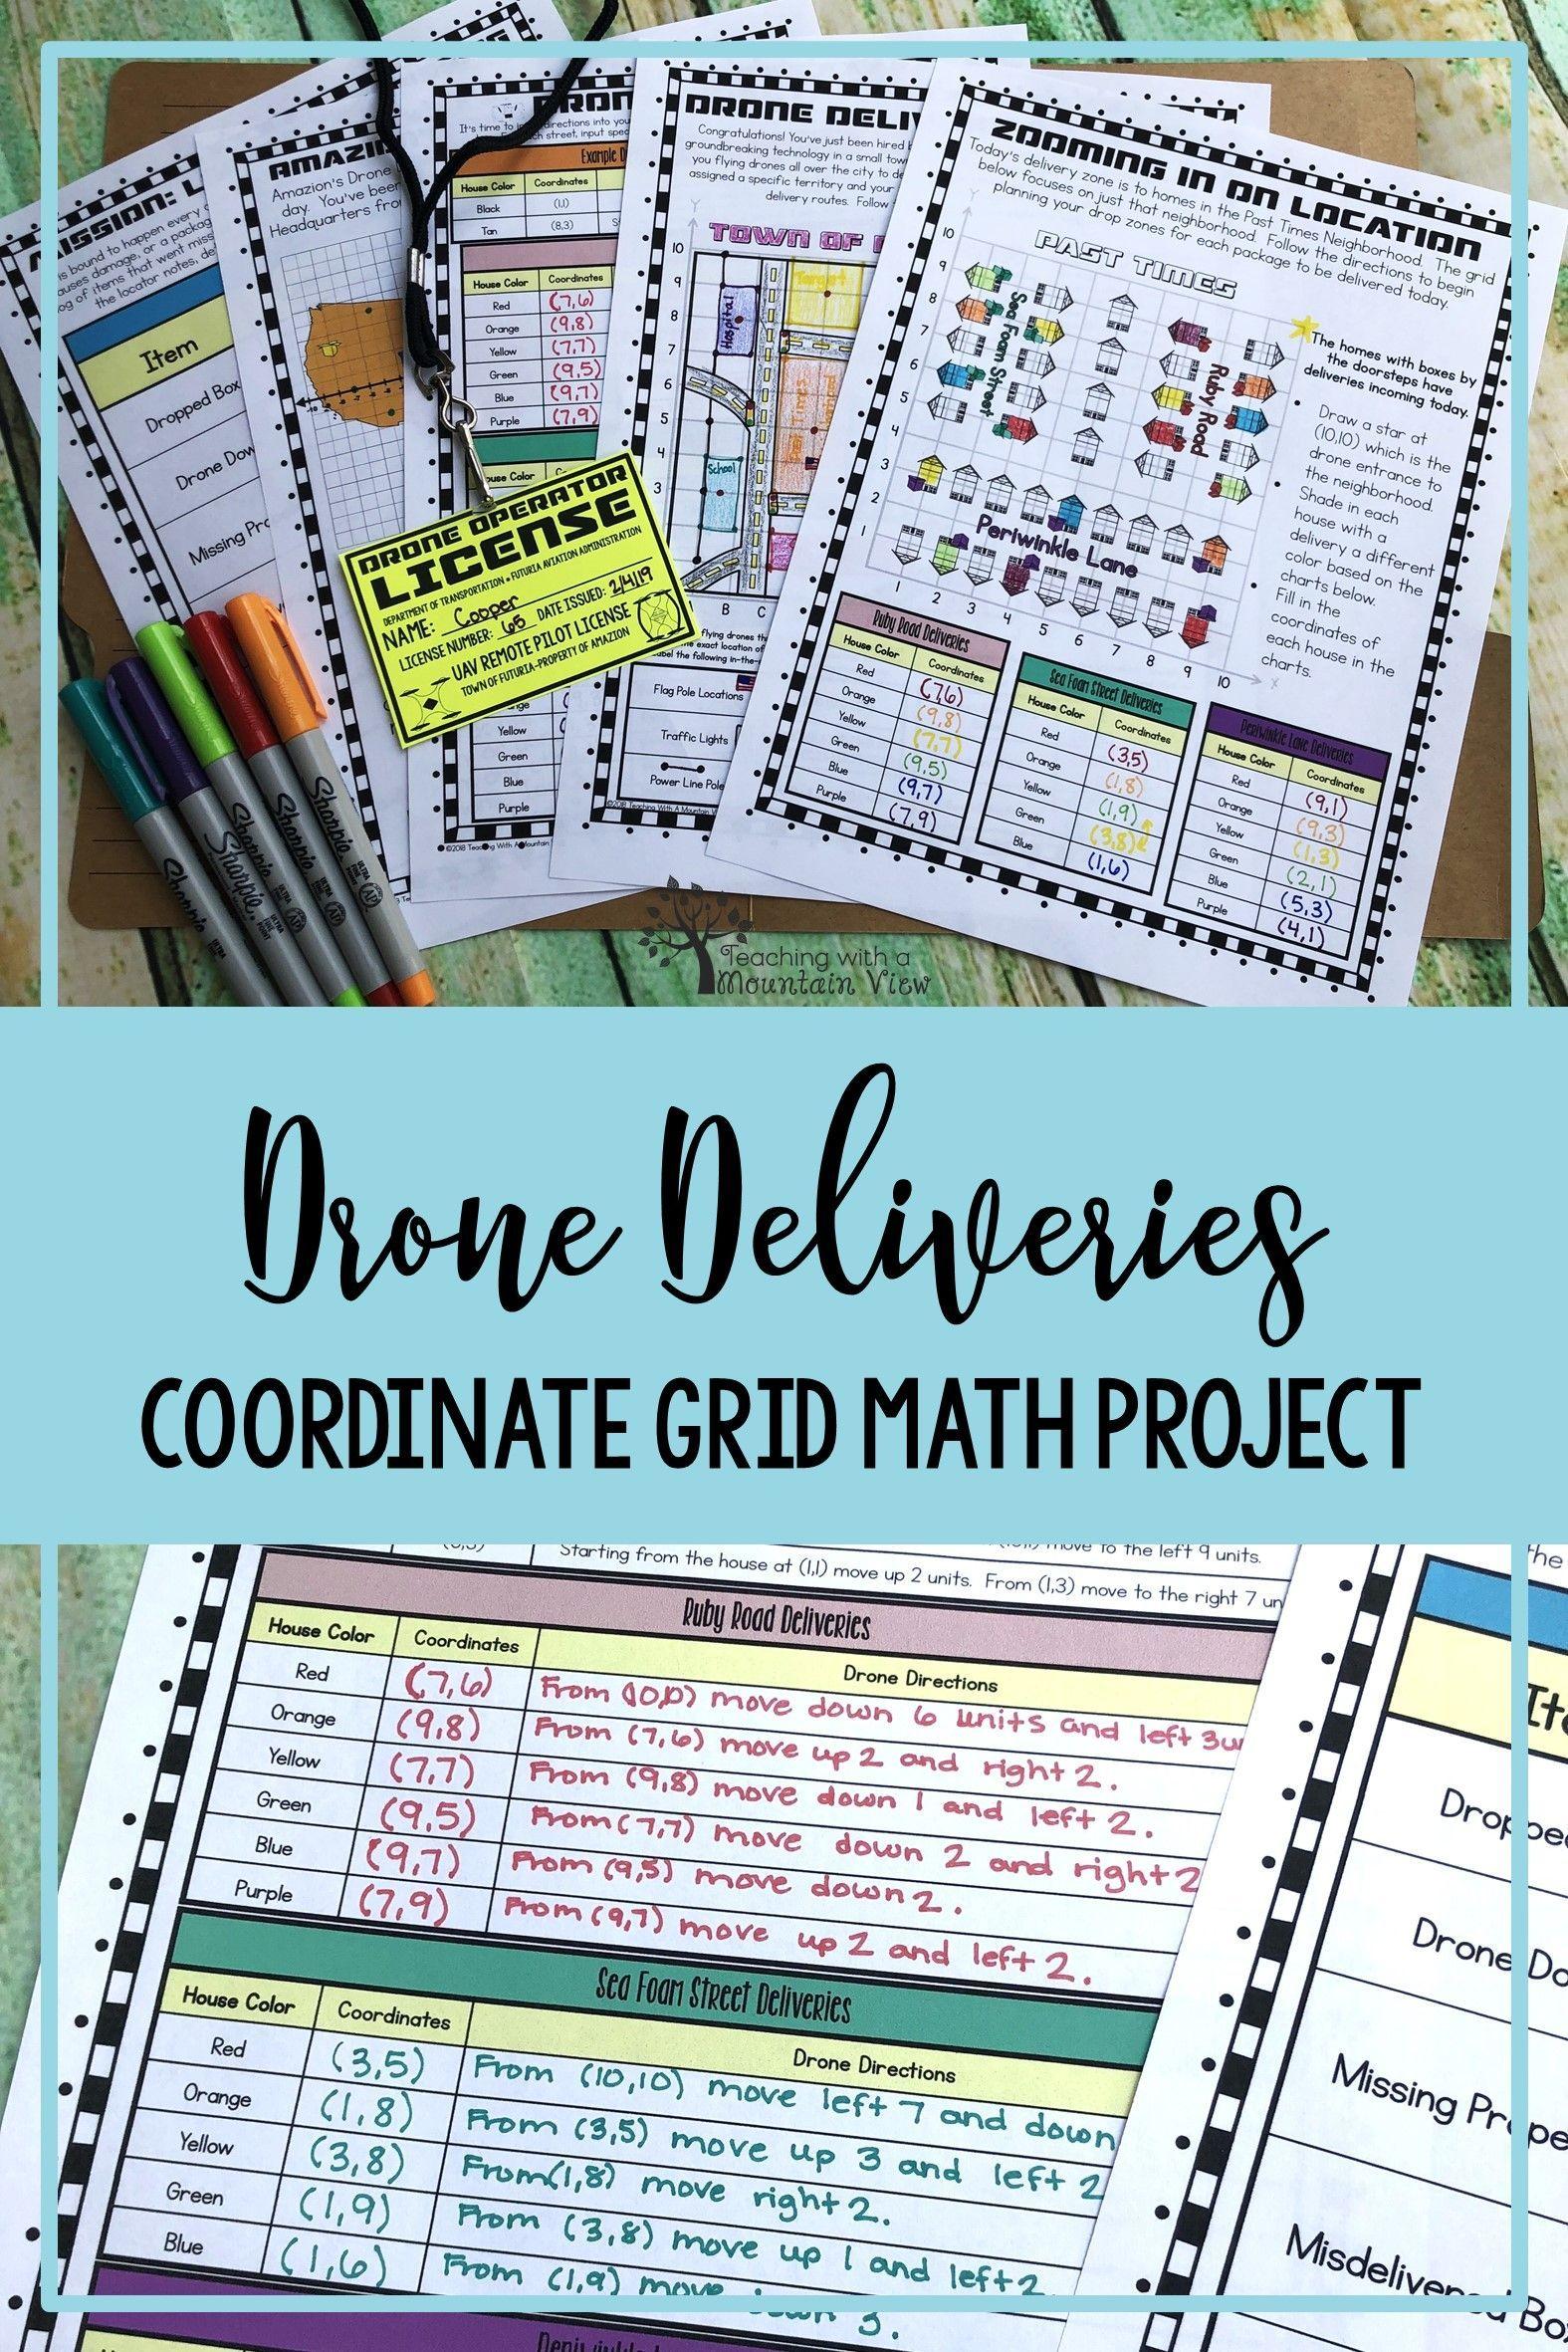 Coordinate Grid Math Project